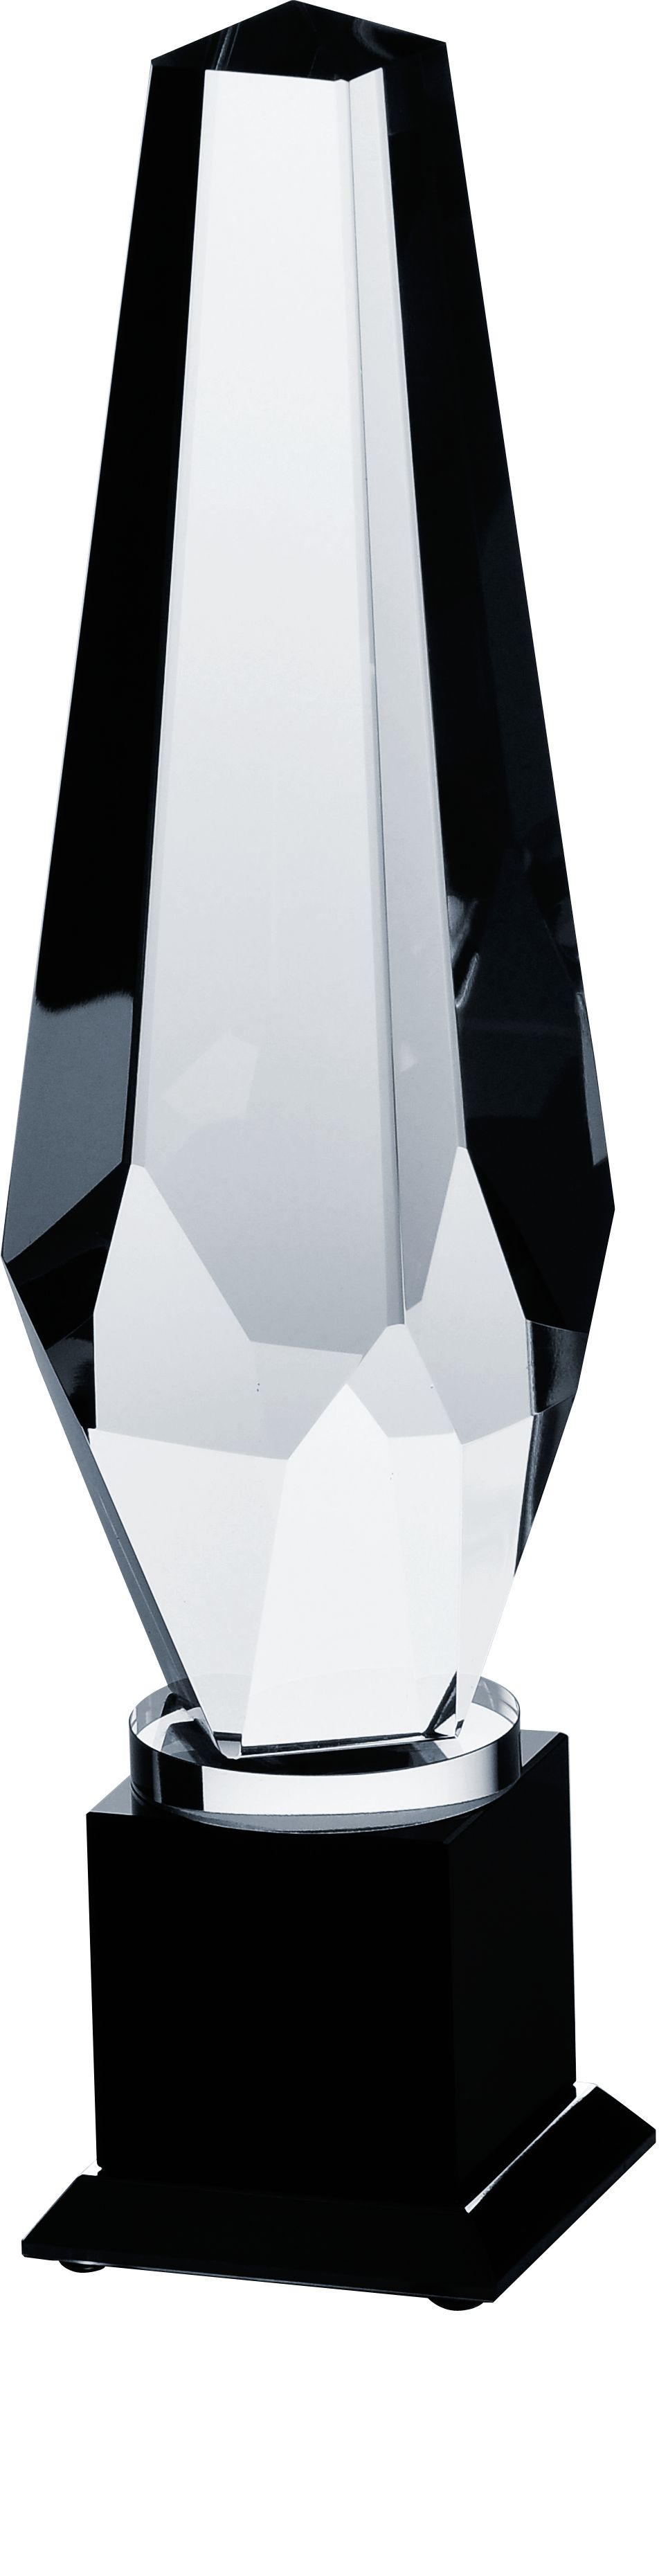 Szklana statuetka C020A,C020B,C020C